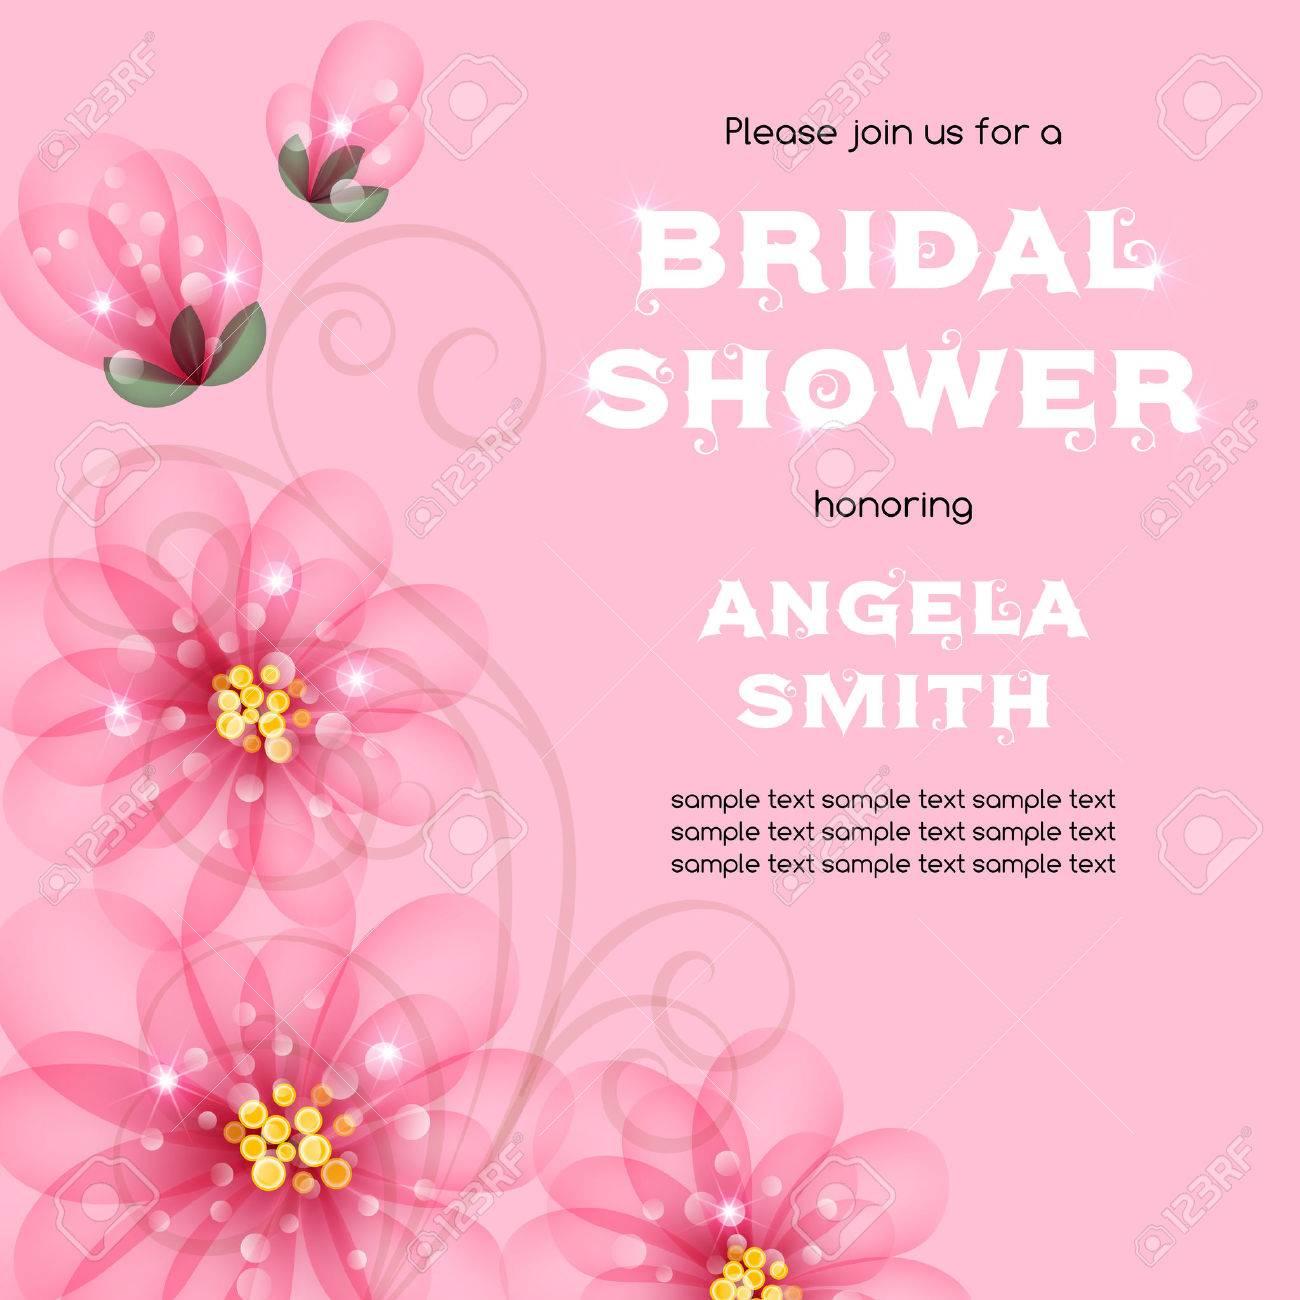 100 template for bridal shower invitation free bridal showe